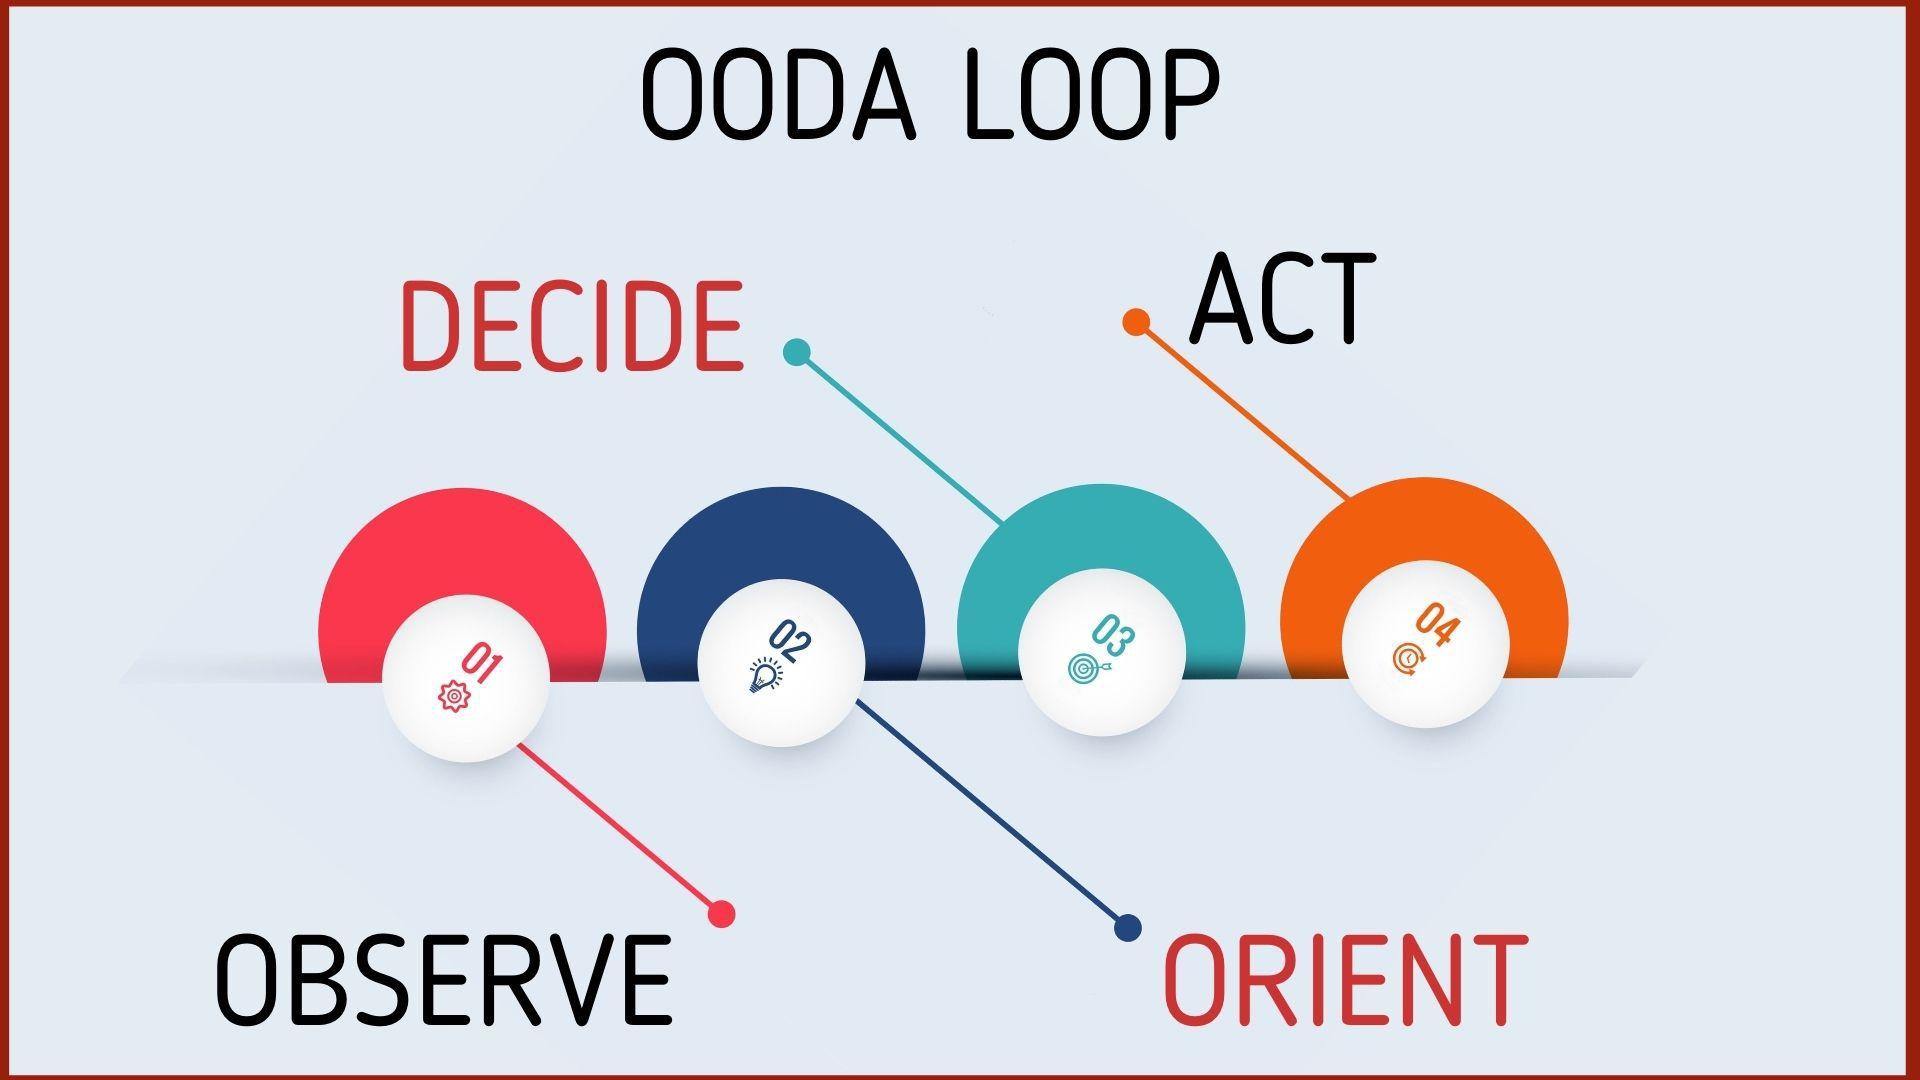 Steps involved in the OODA loop